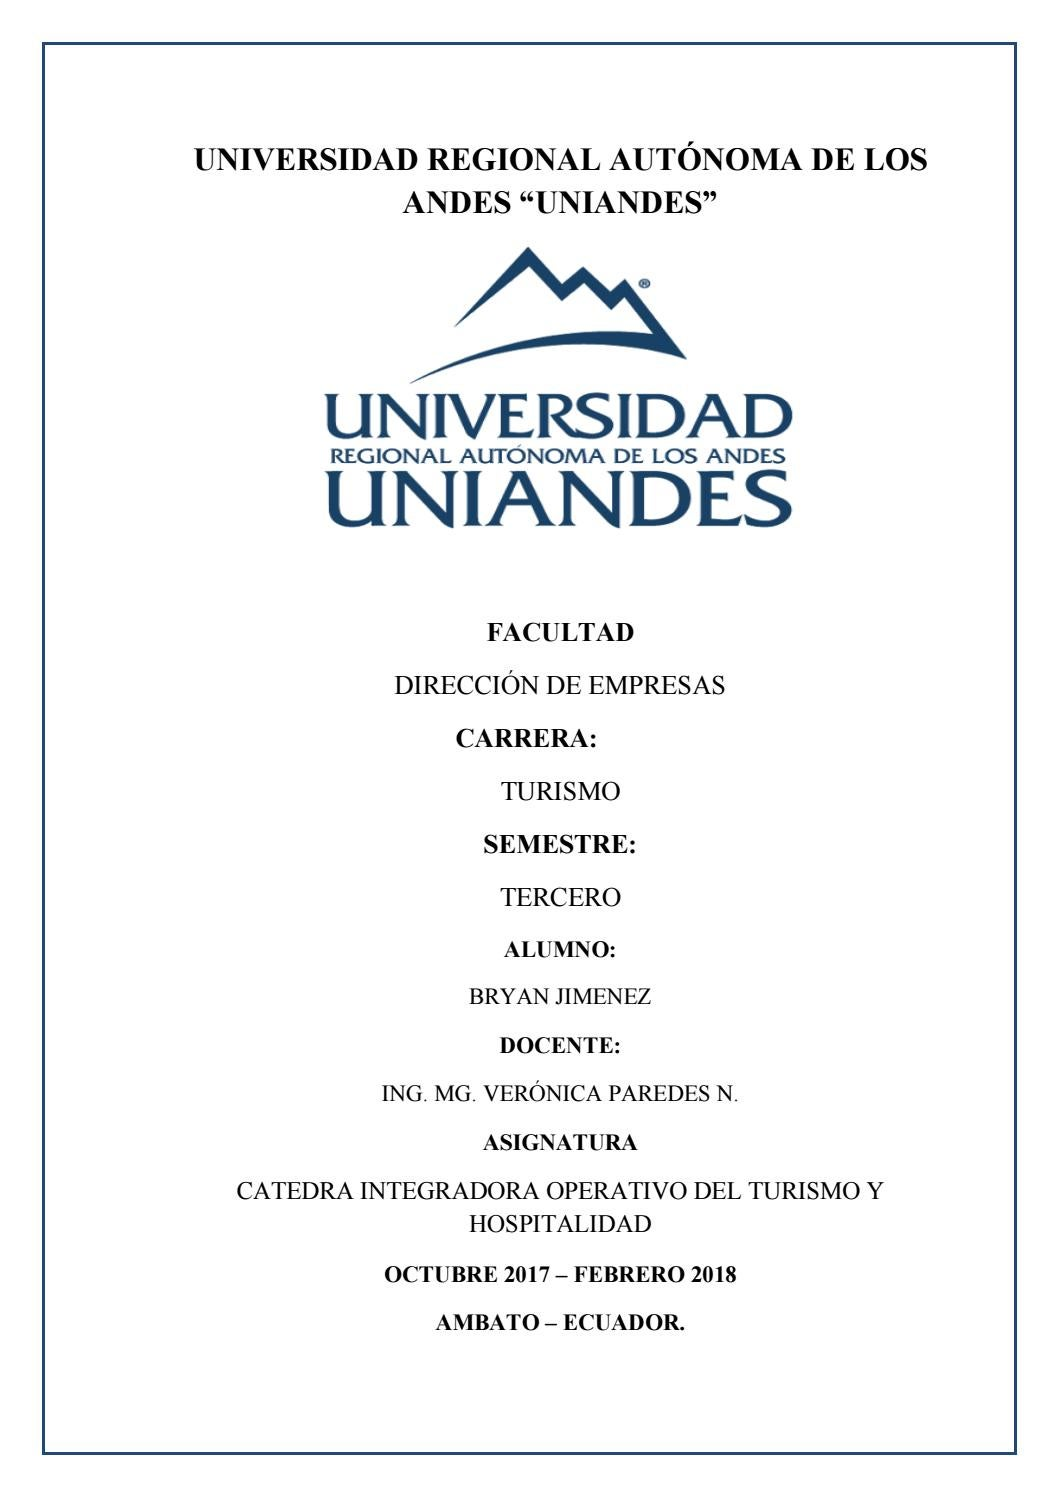 Portafolio catedra integradora gestion opertiva del turismo y ...